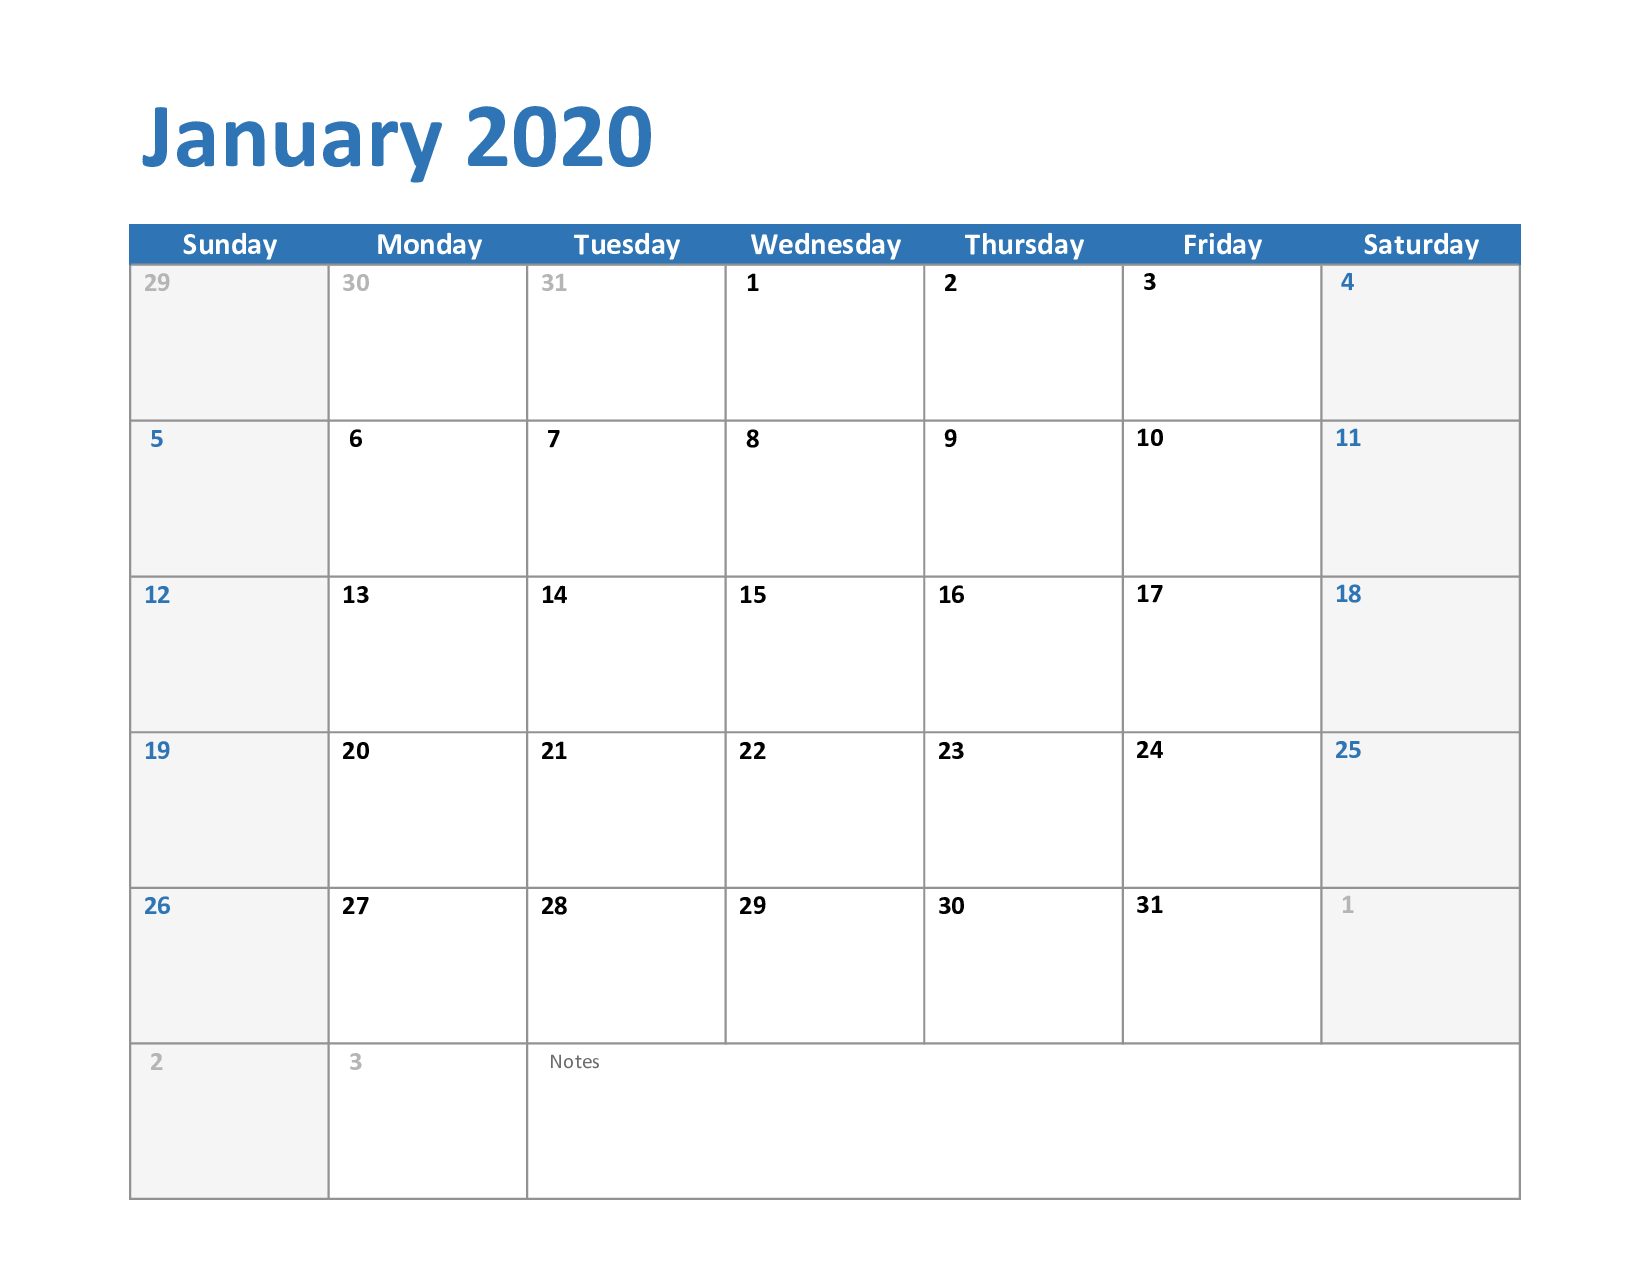 January 2020 Calendar Printable Free | Printable Calendar throughout Free Printable 2020 Employee Attendance Calendar